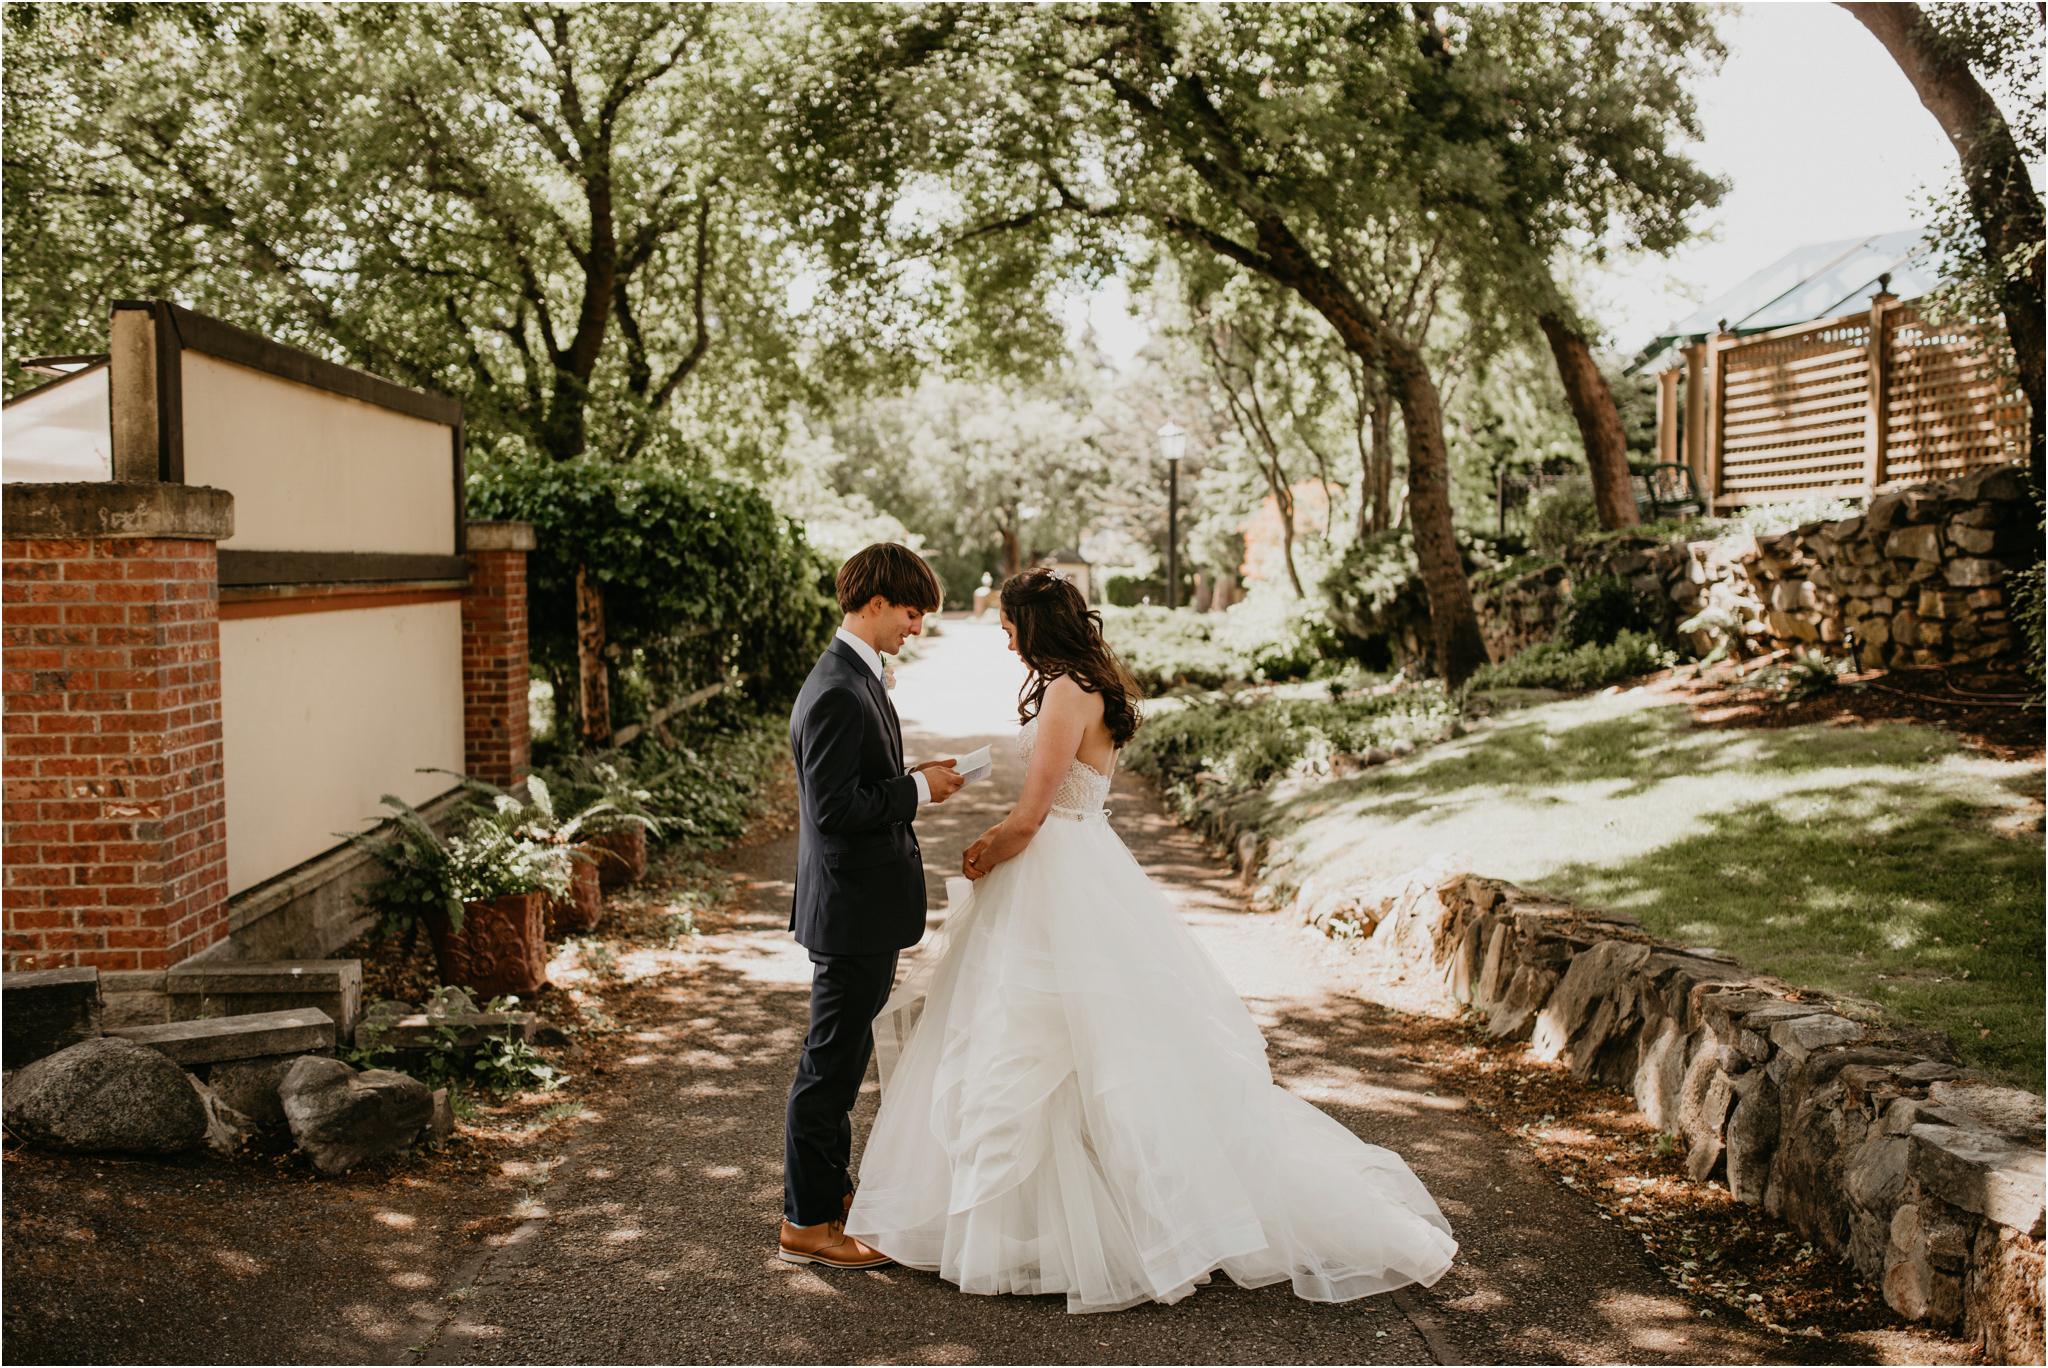 chance-and-ondrea-lairmont-manor-wedding-seattle-photographer-051.jpg